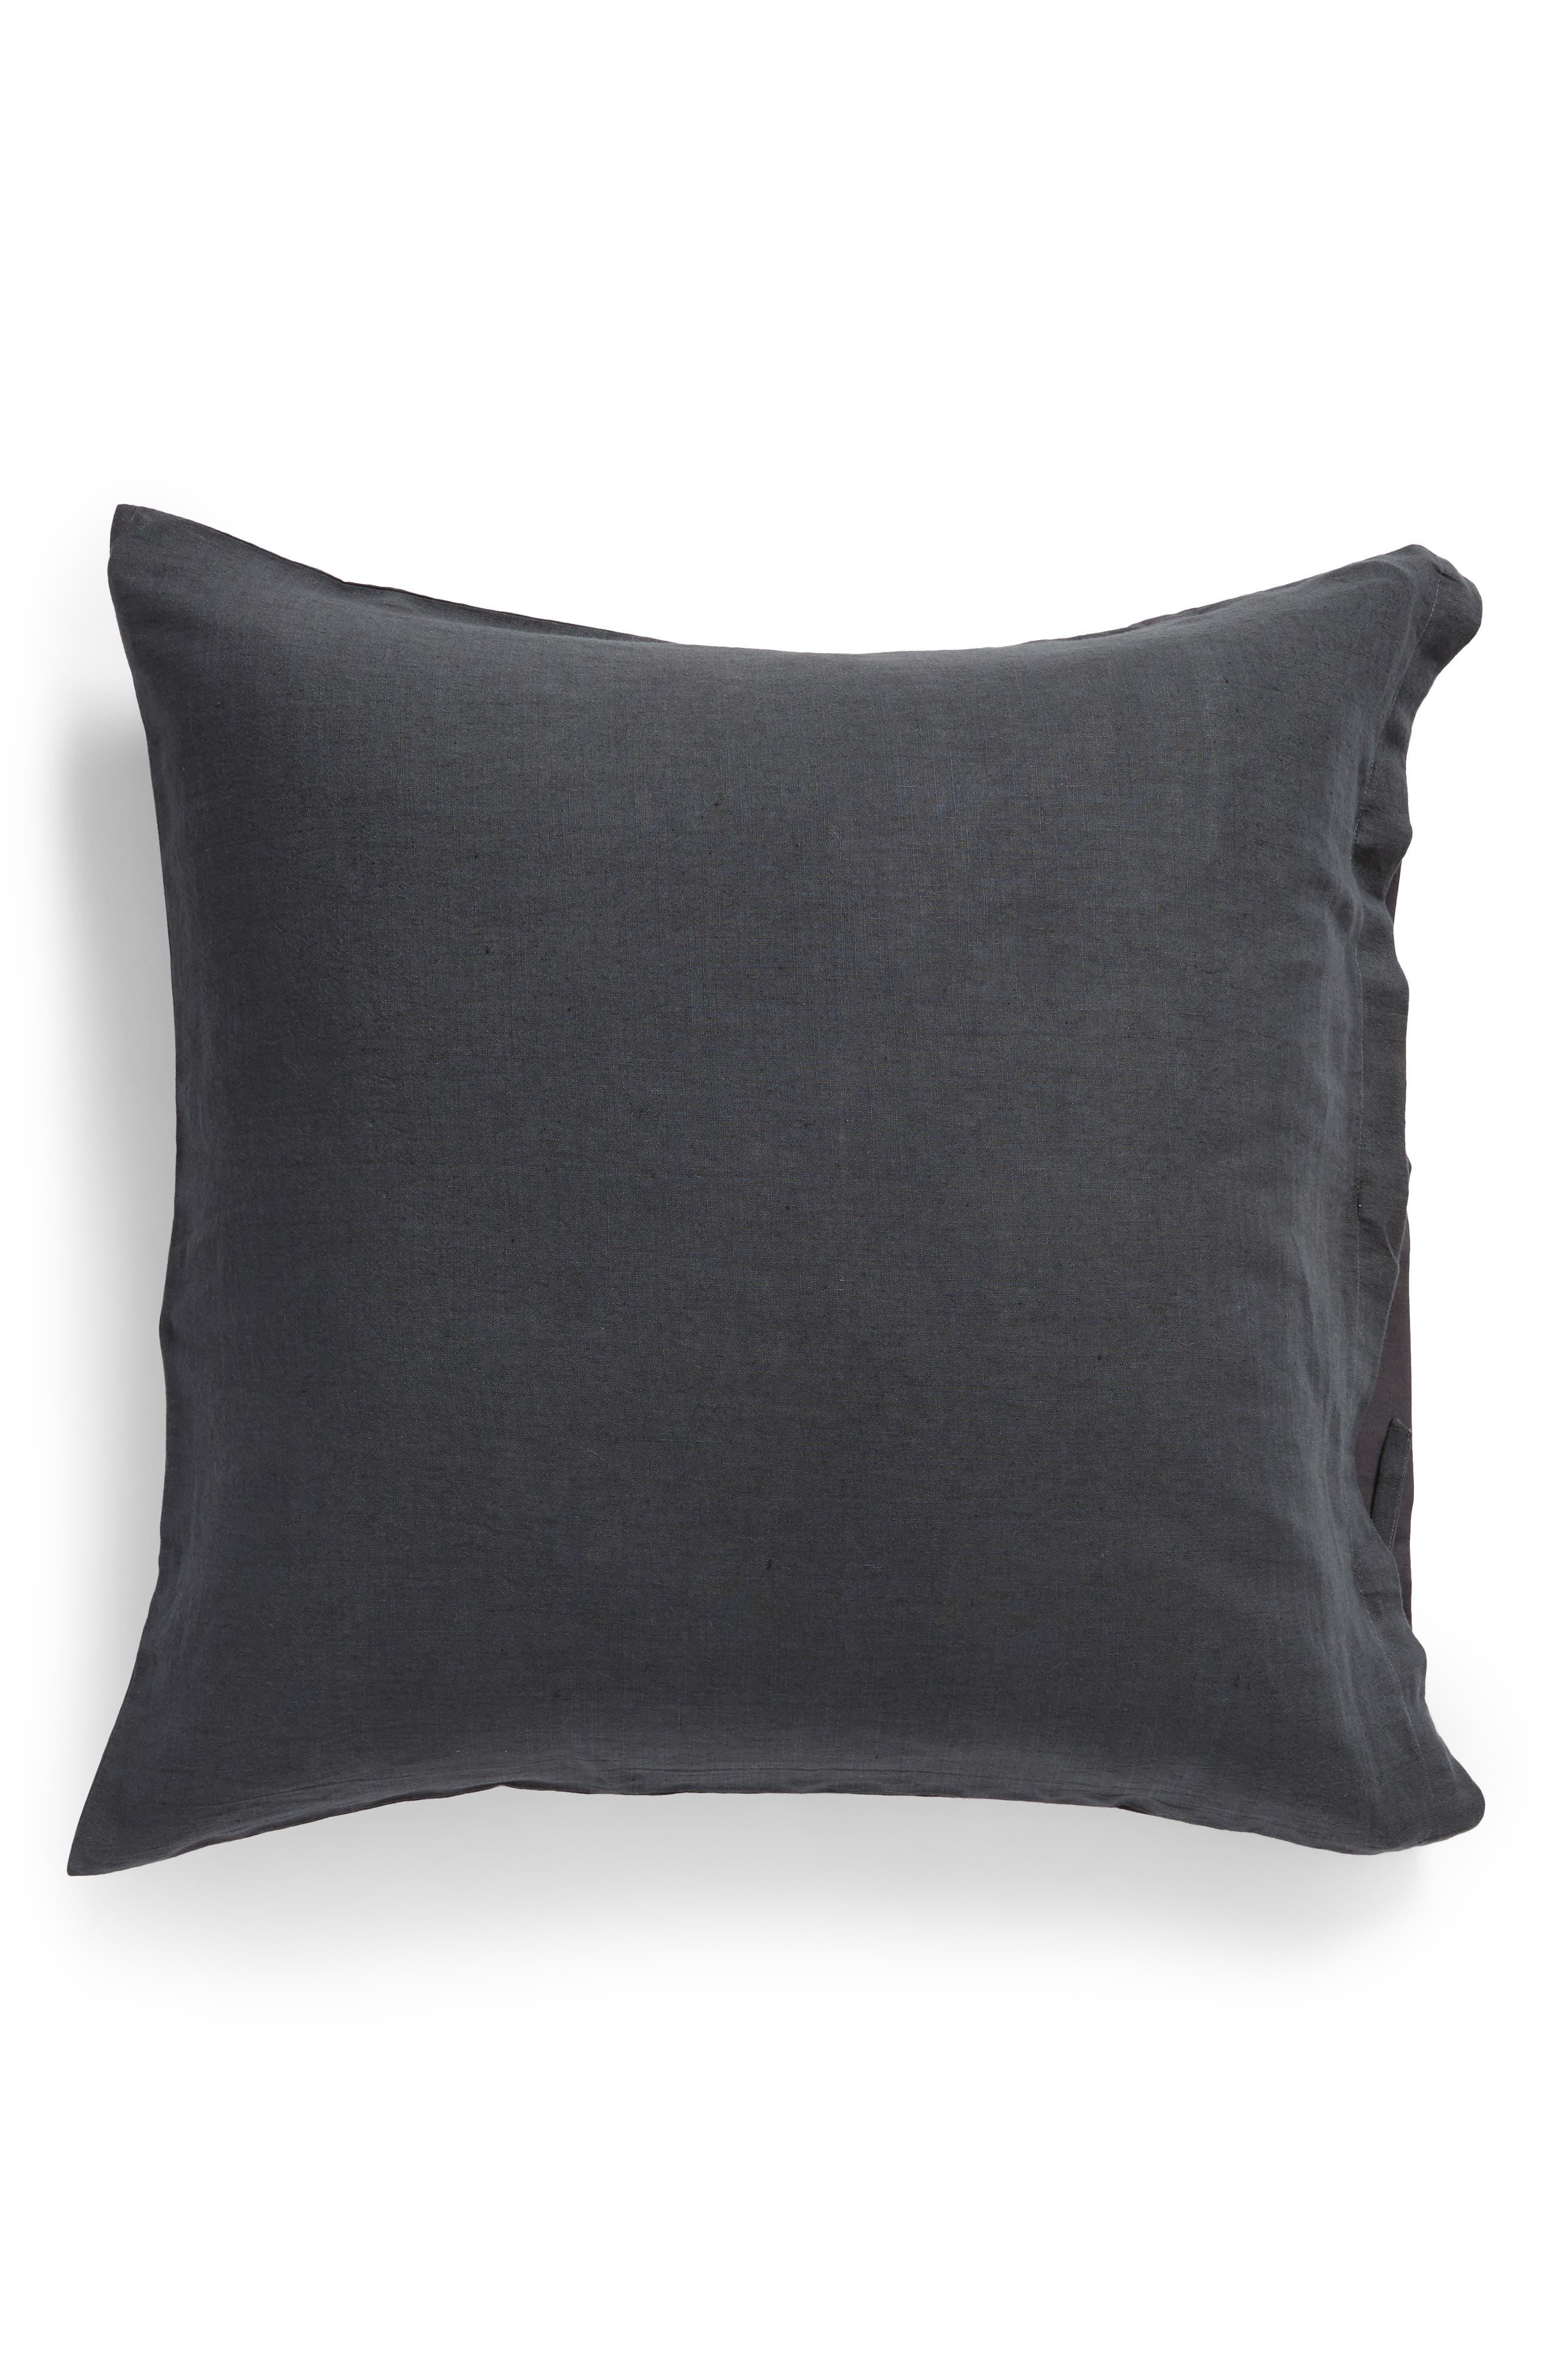 TREASURE & BOND, Relaxed Cotton & Linen Euro Sham, Main thumbnail 1, color, GREY ONYX